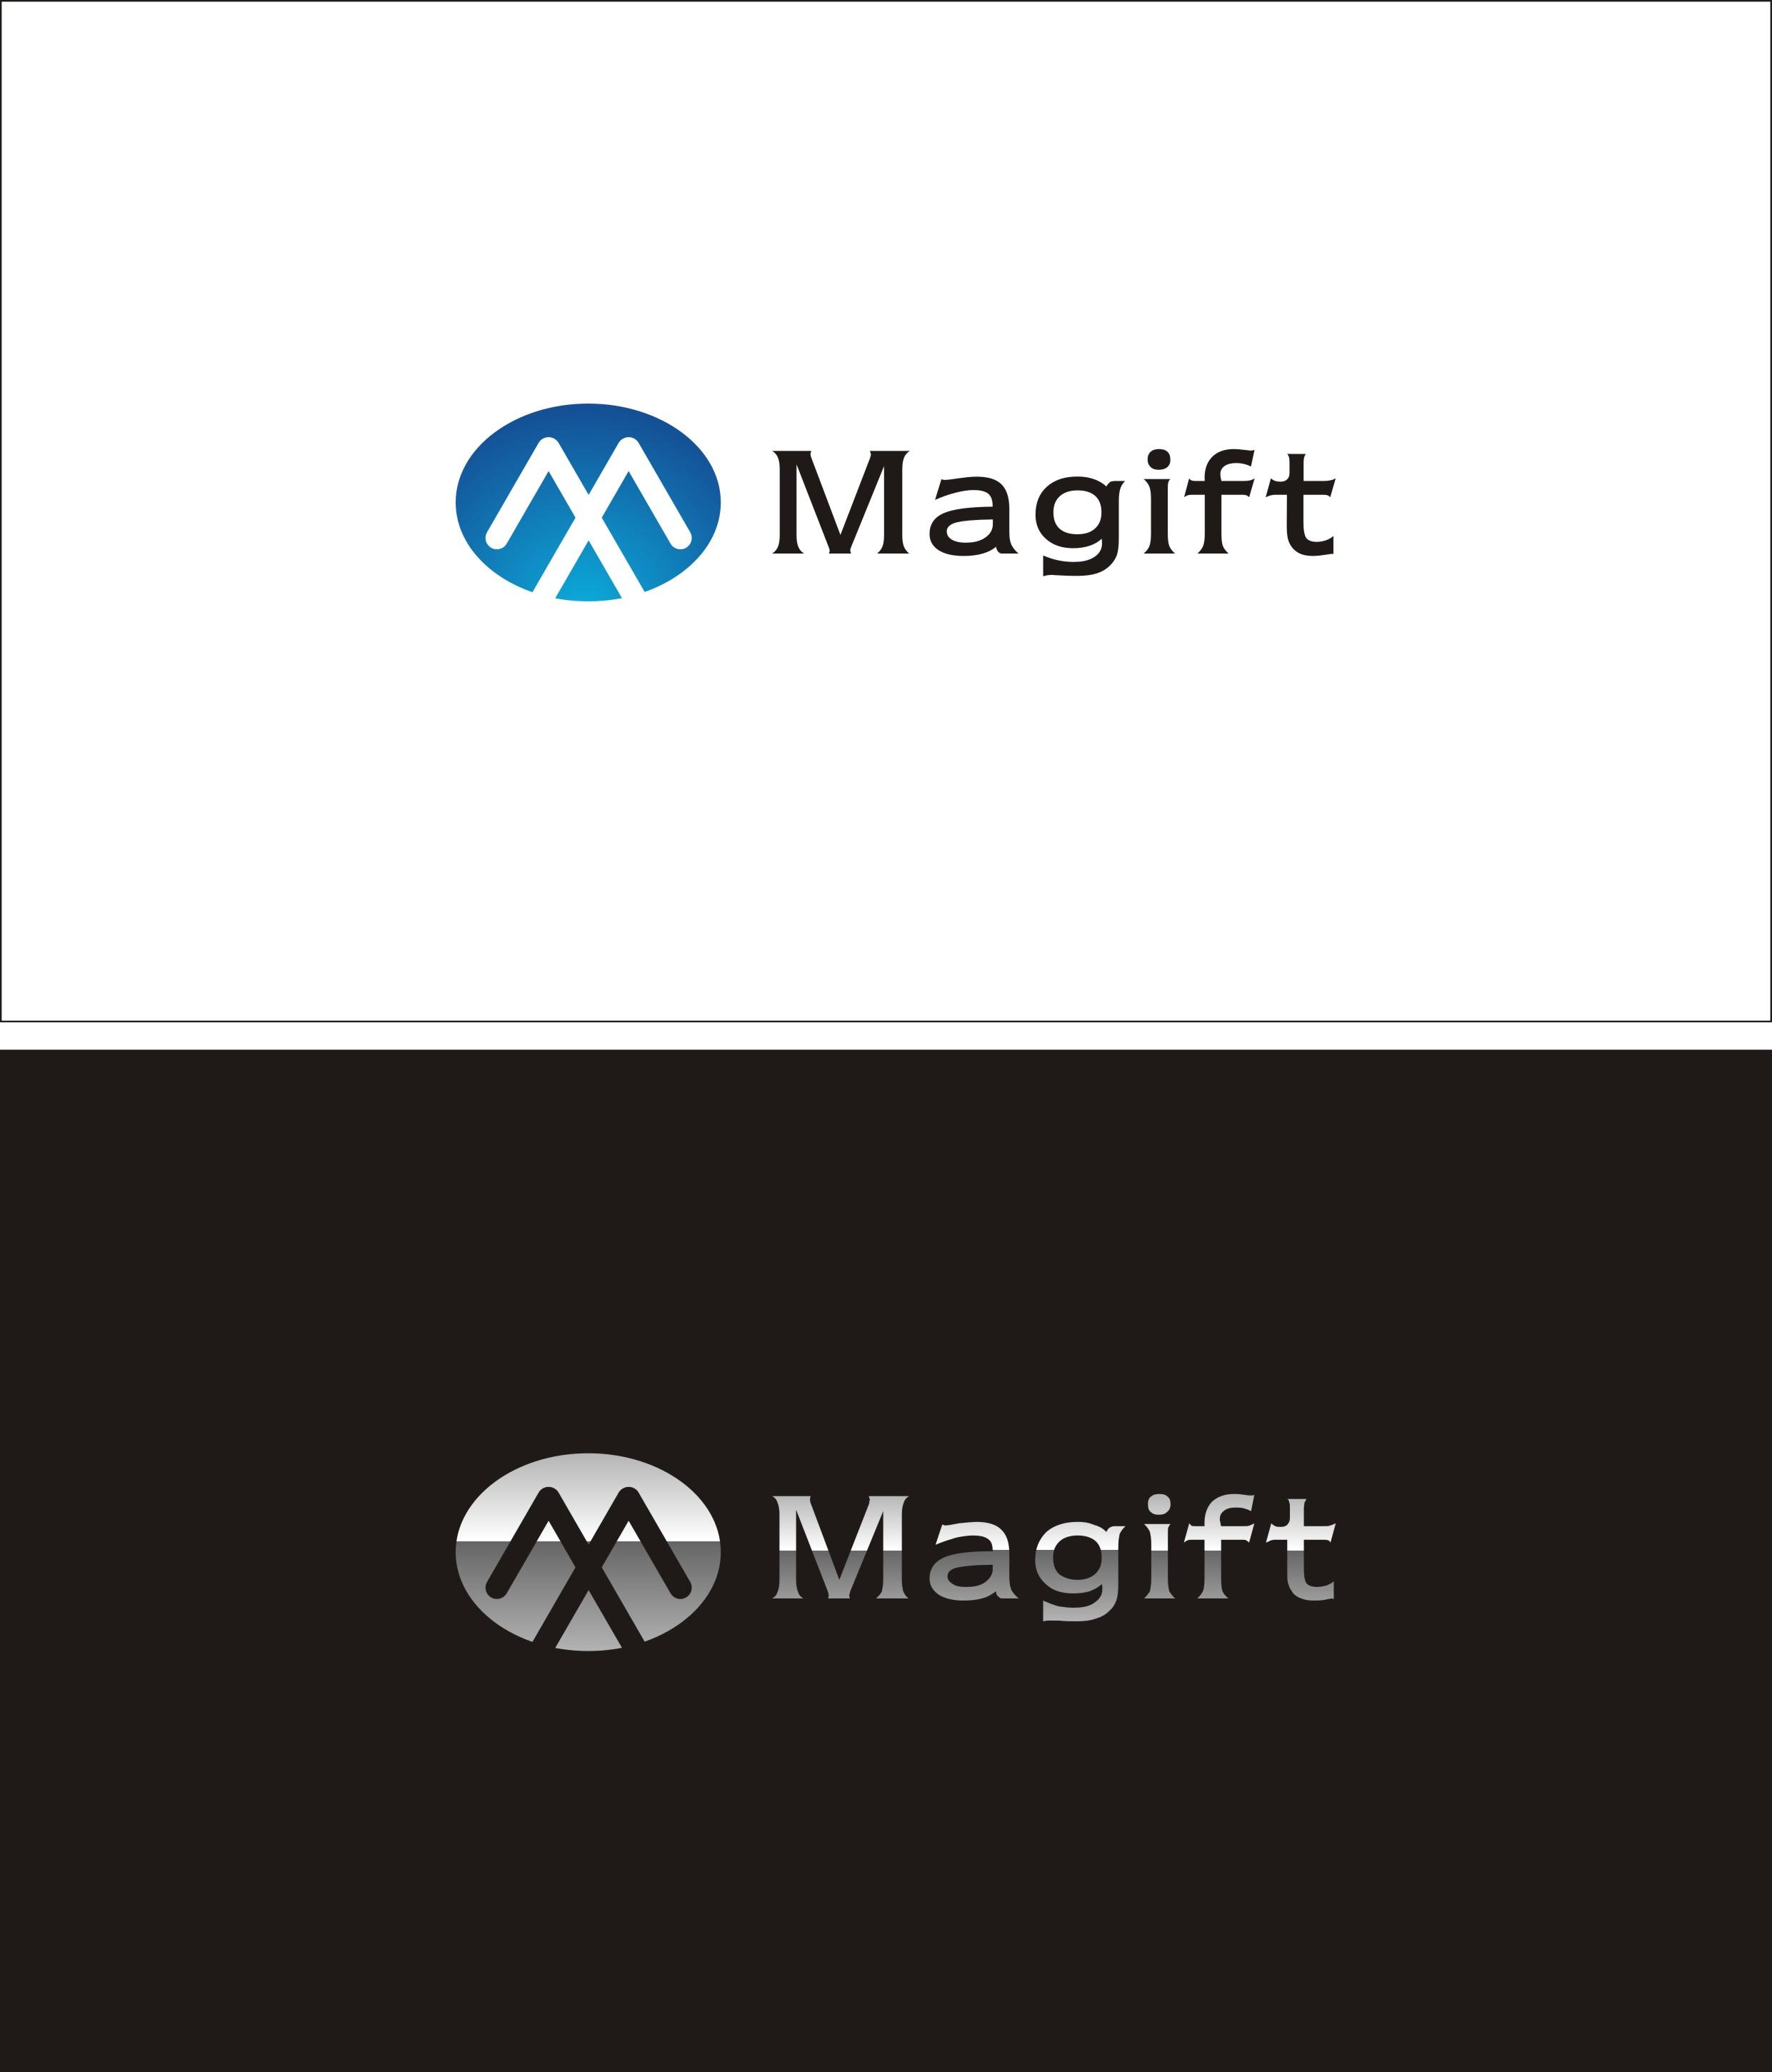 Magift蓝牙耳机品牌Logo设计_2943622_k68威客网